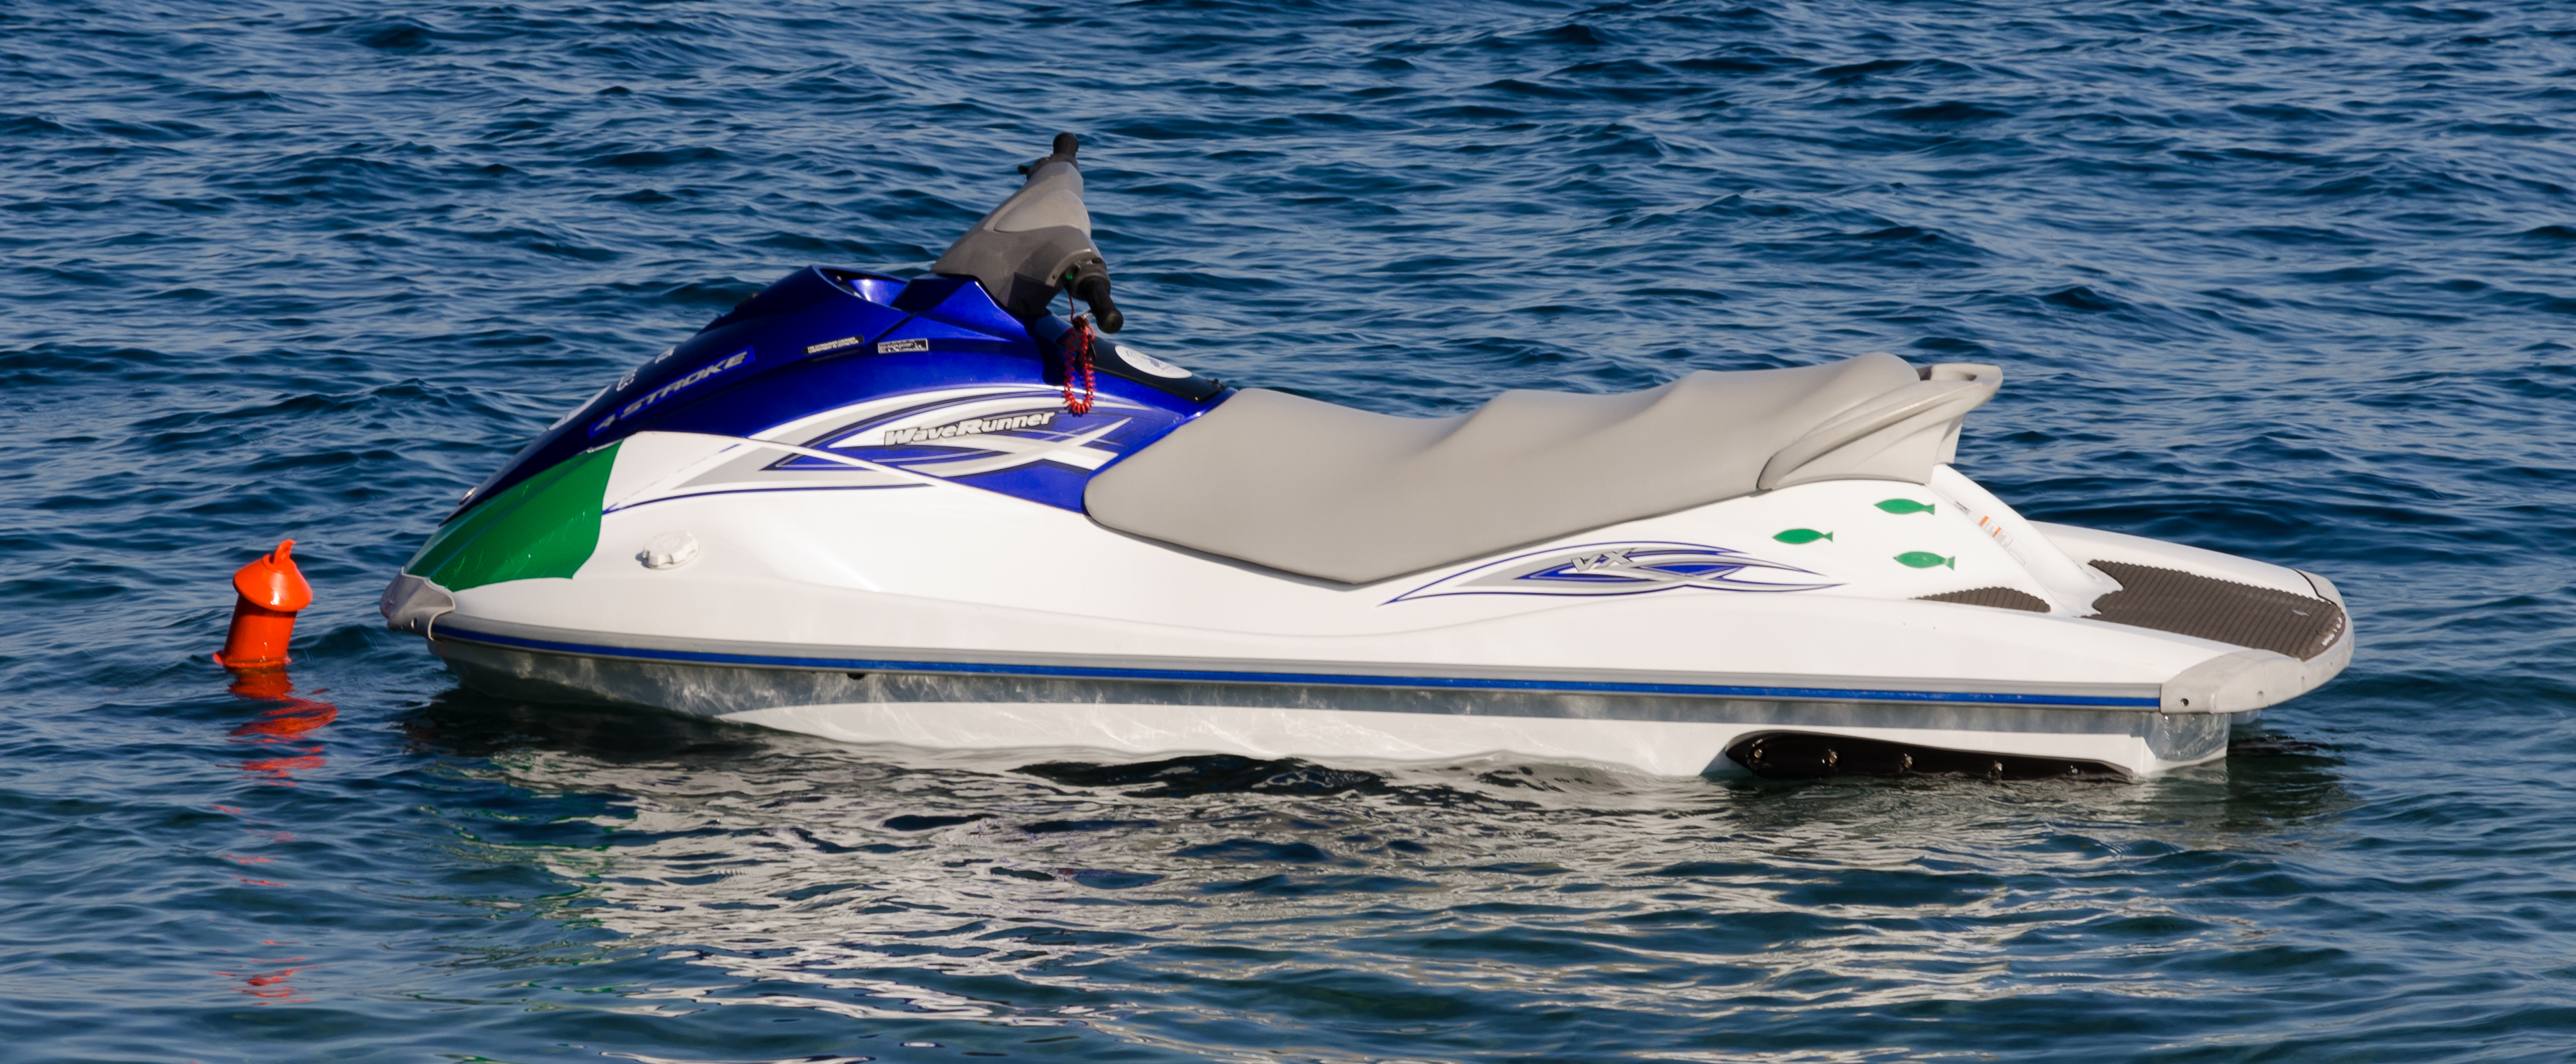 Yamaha Waverunner For Sale Lake Bomoseen Vt